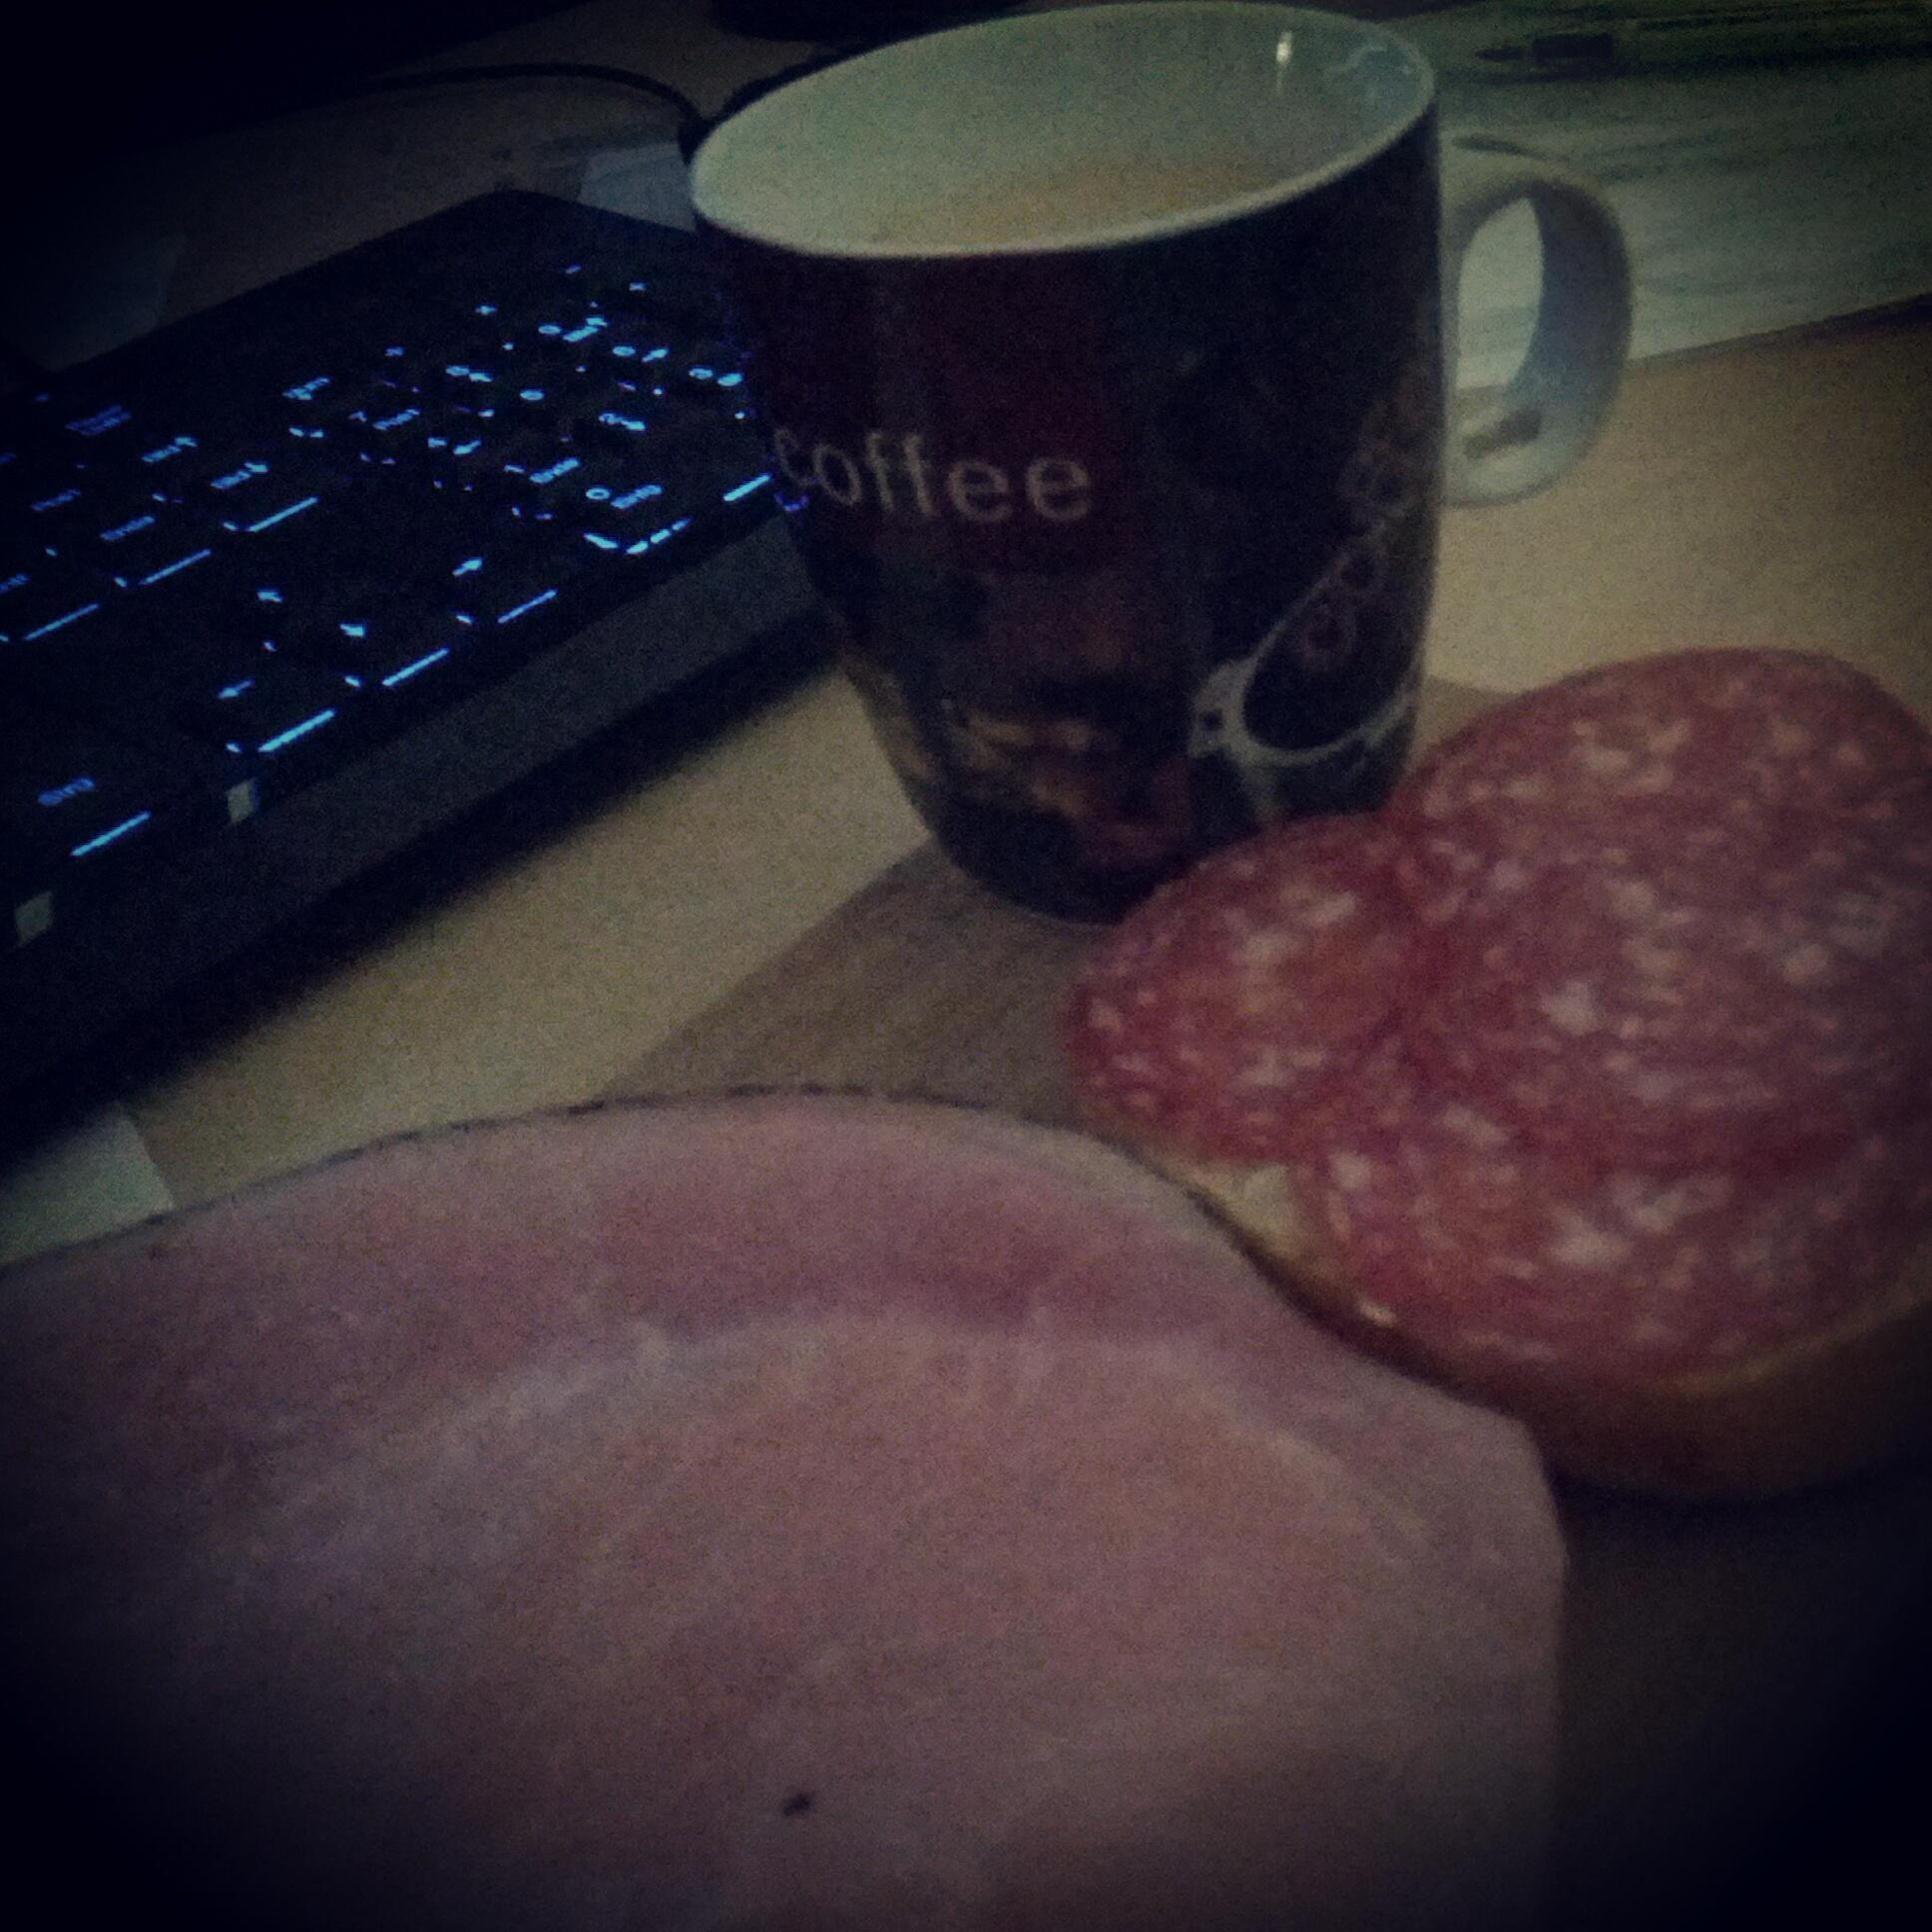 https://foodloader.net/c64_2012-10-20_breads-&-coffee.jpg